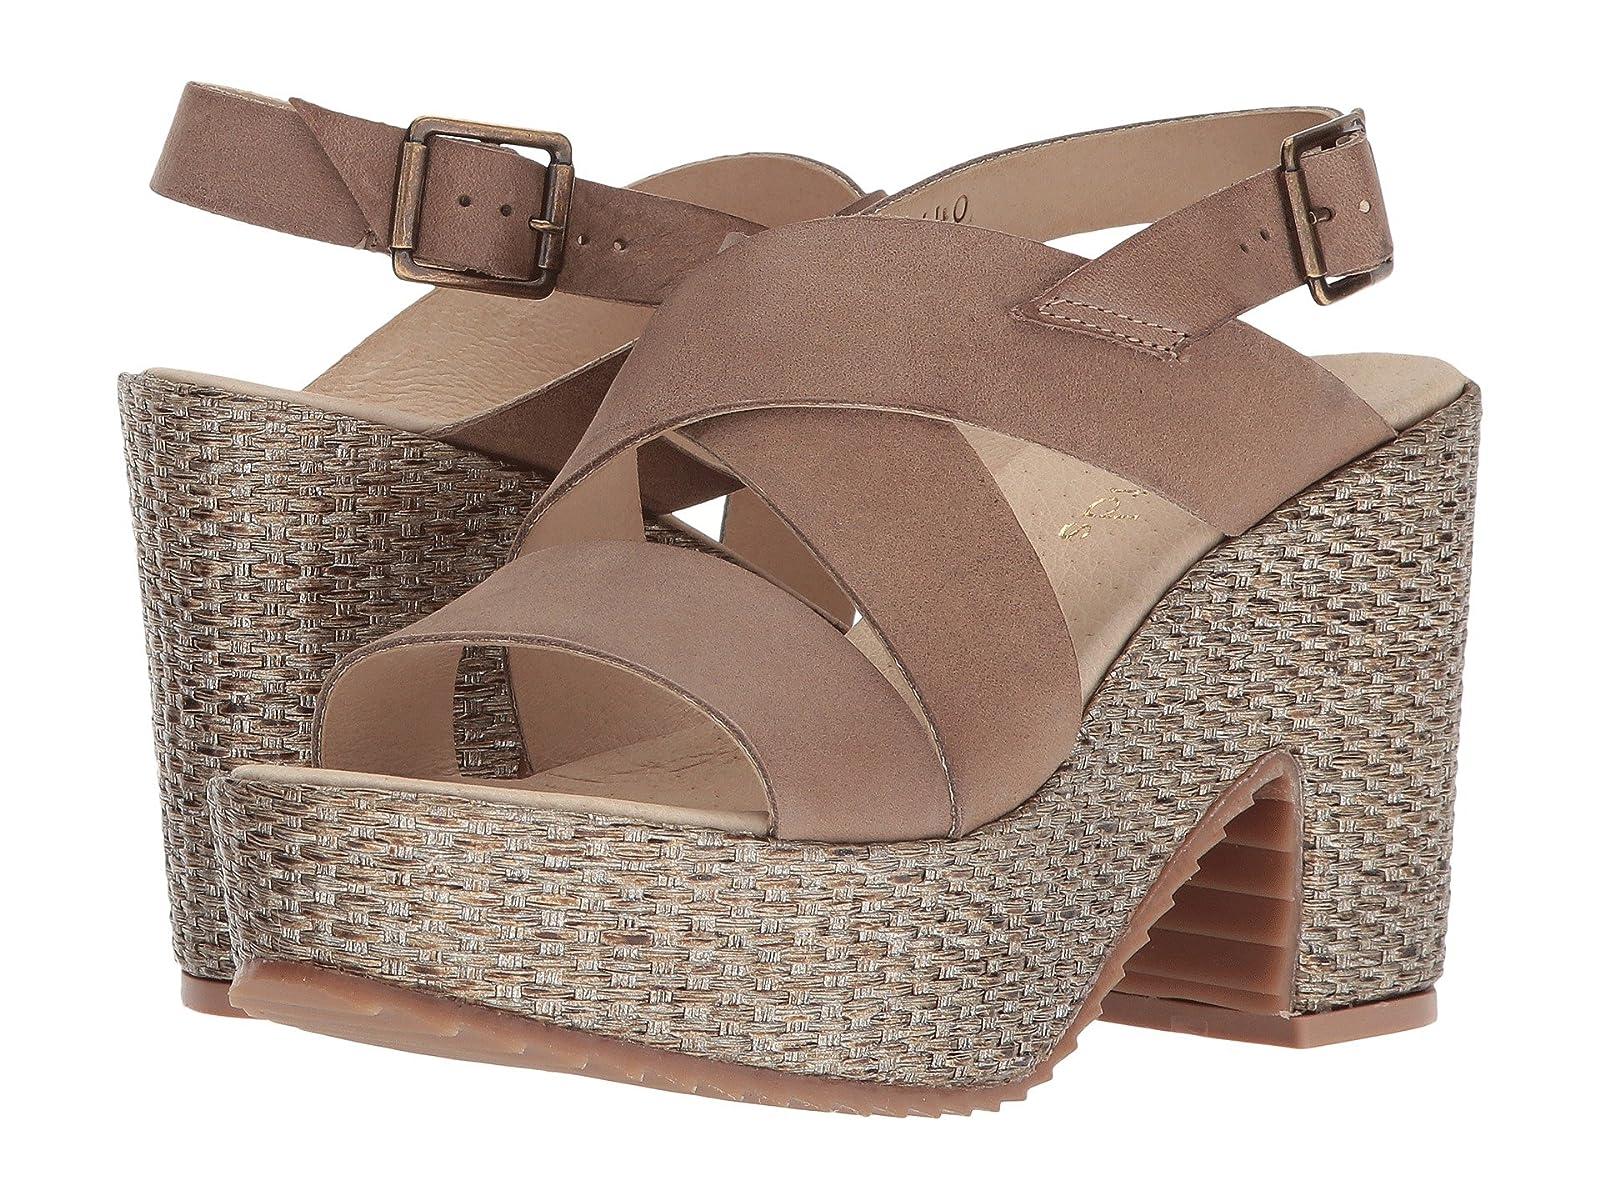 Cordani LourdesCheap and distinctive eye-catching shoes